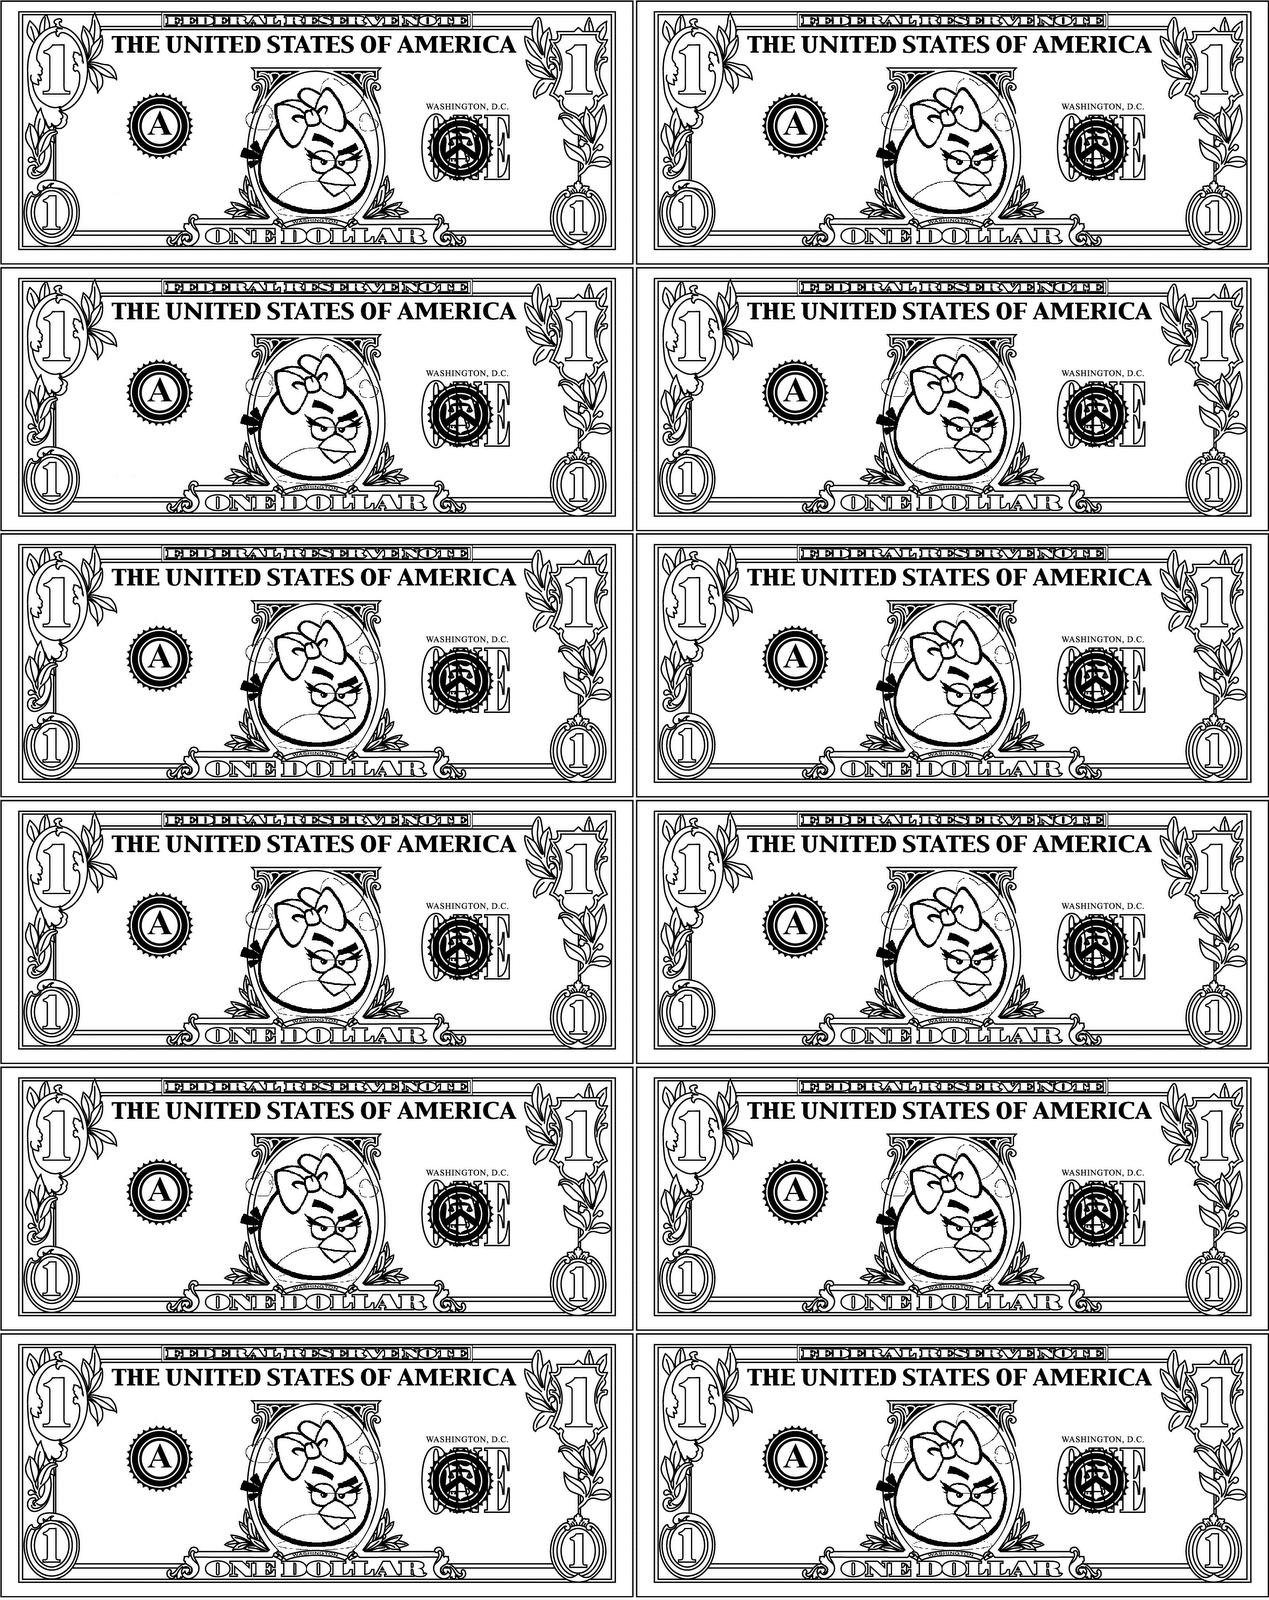 Printable Play Money For Kids | Paper Game For Kids | Pinterest - Free Printable Game Money